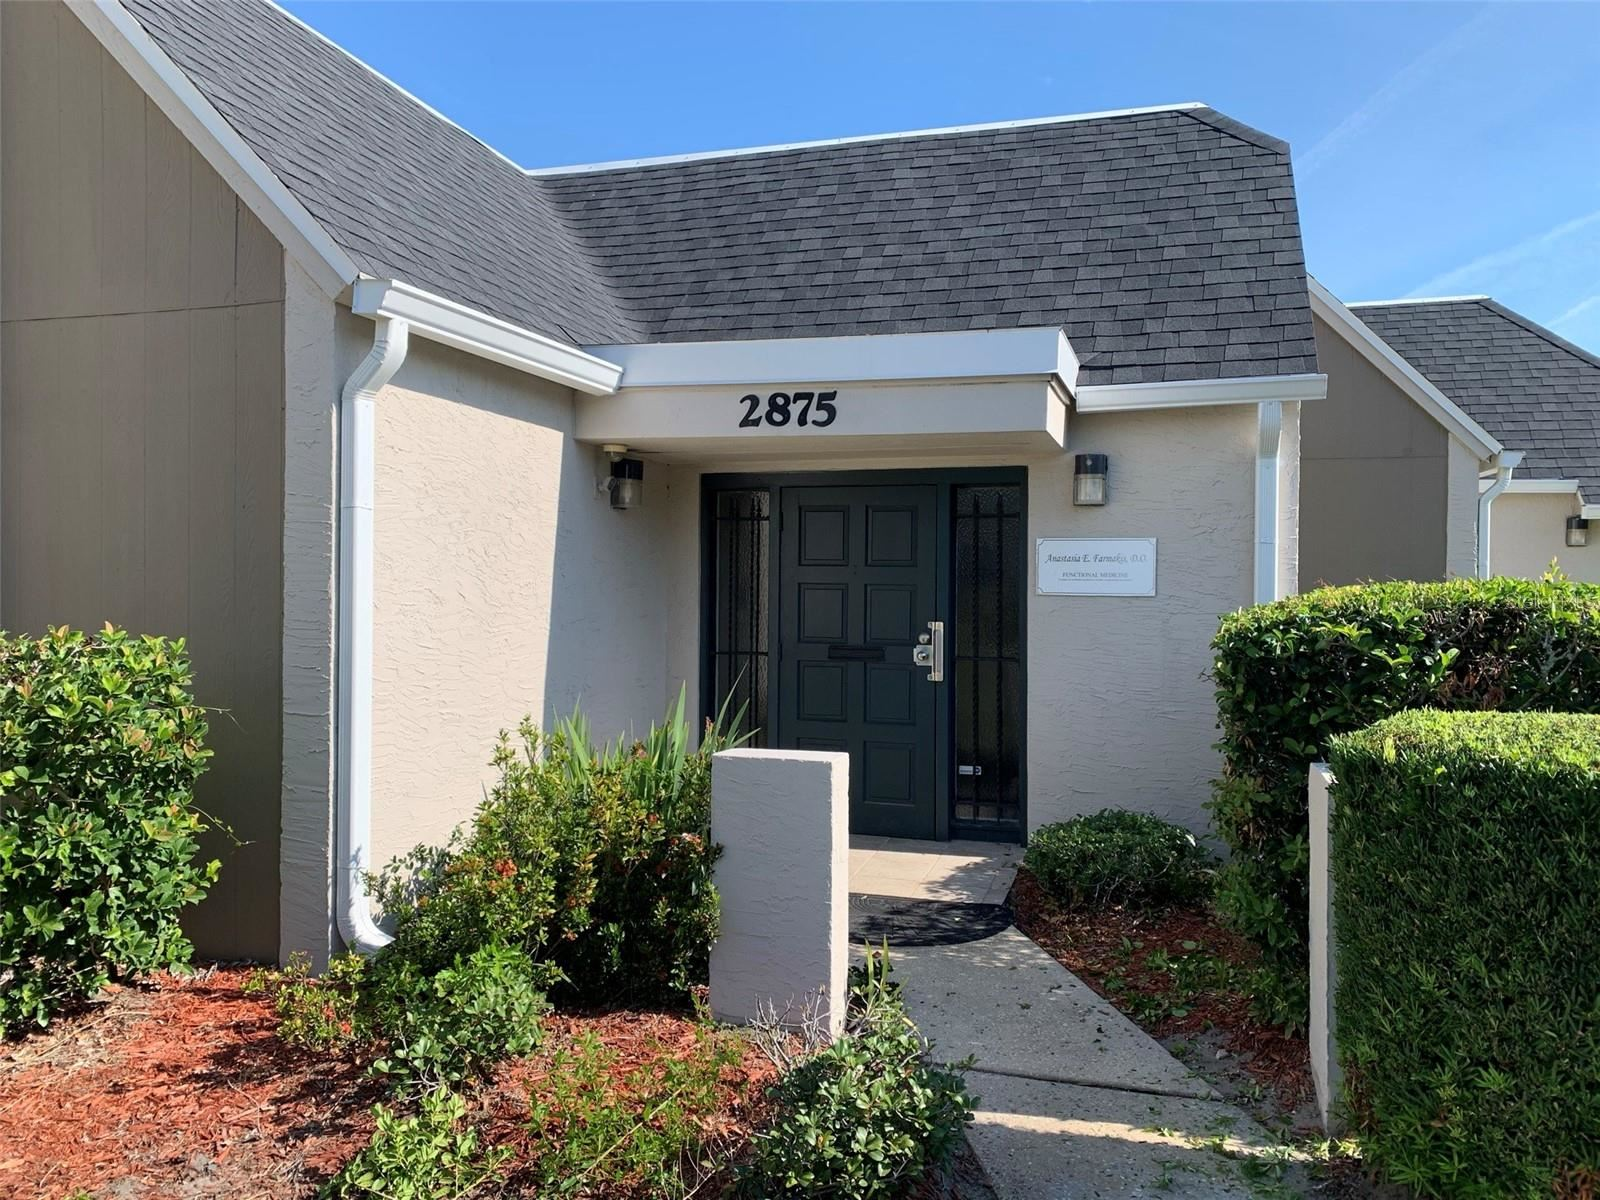 Photo for 2875 DELANEY AVENUE #1, ORLANDO, FL 32806 (MLS # O5958253)